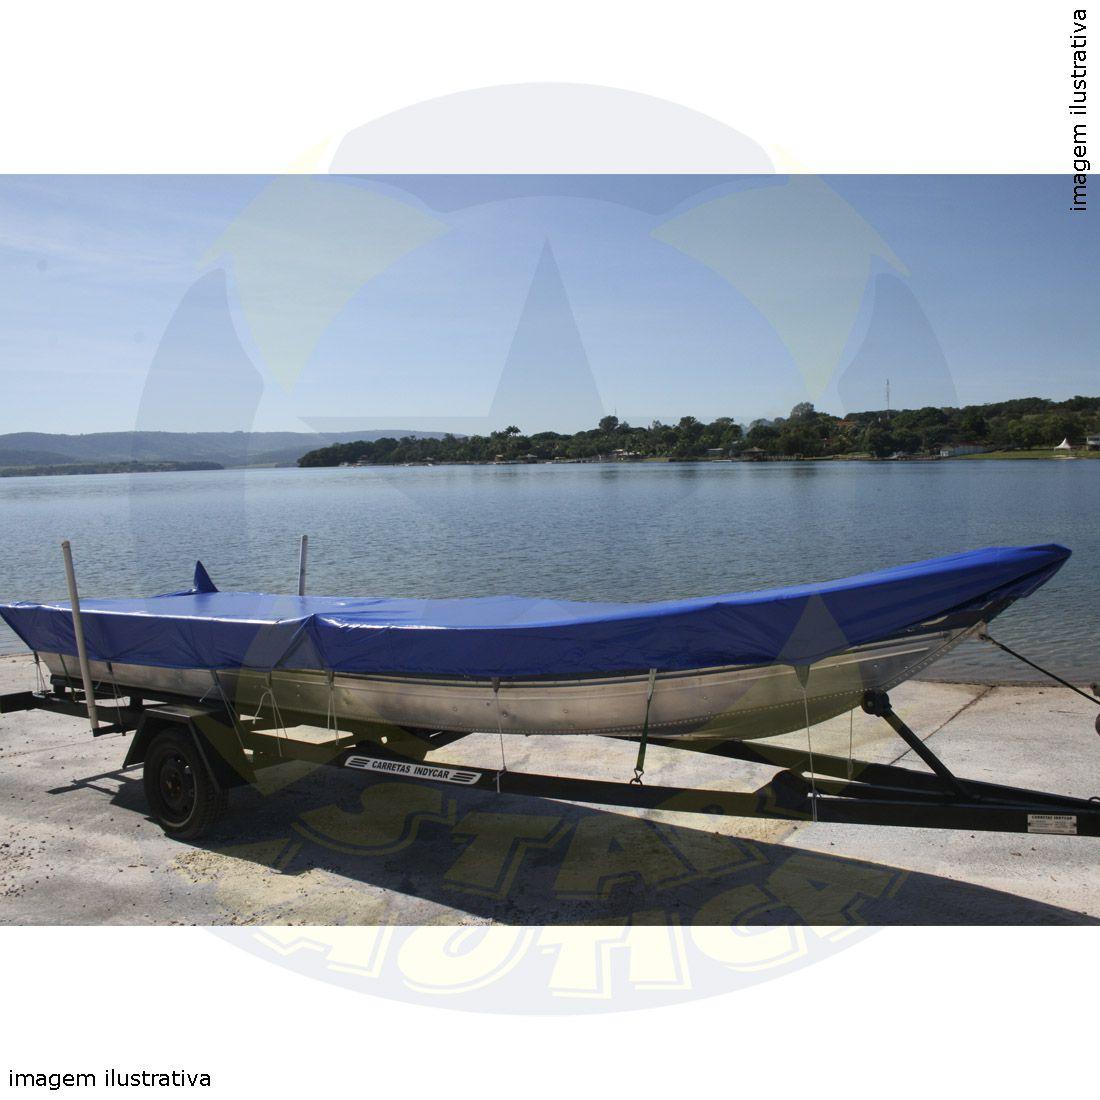 Capa Lona de Cobertura Barco Pety 600 Lona Vinílica